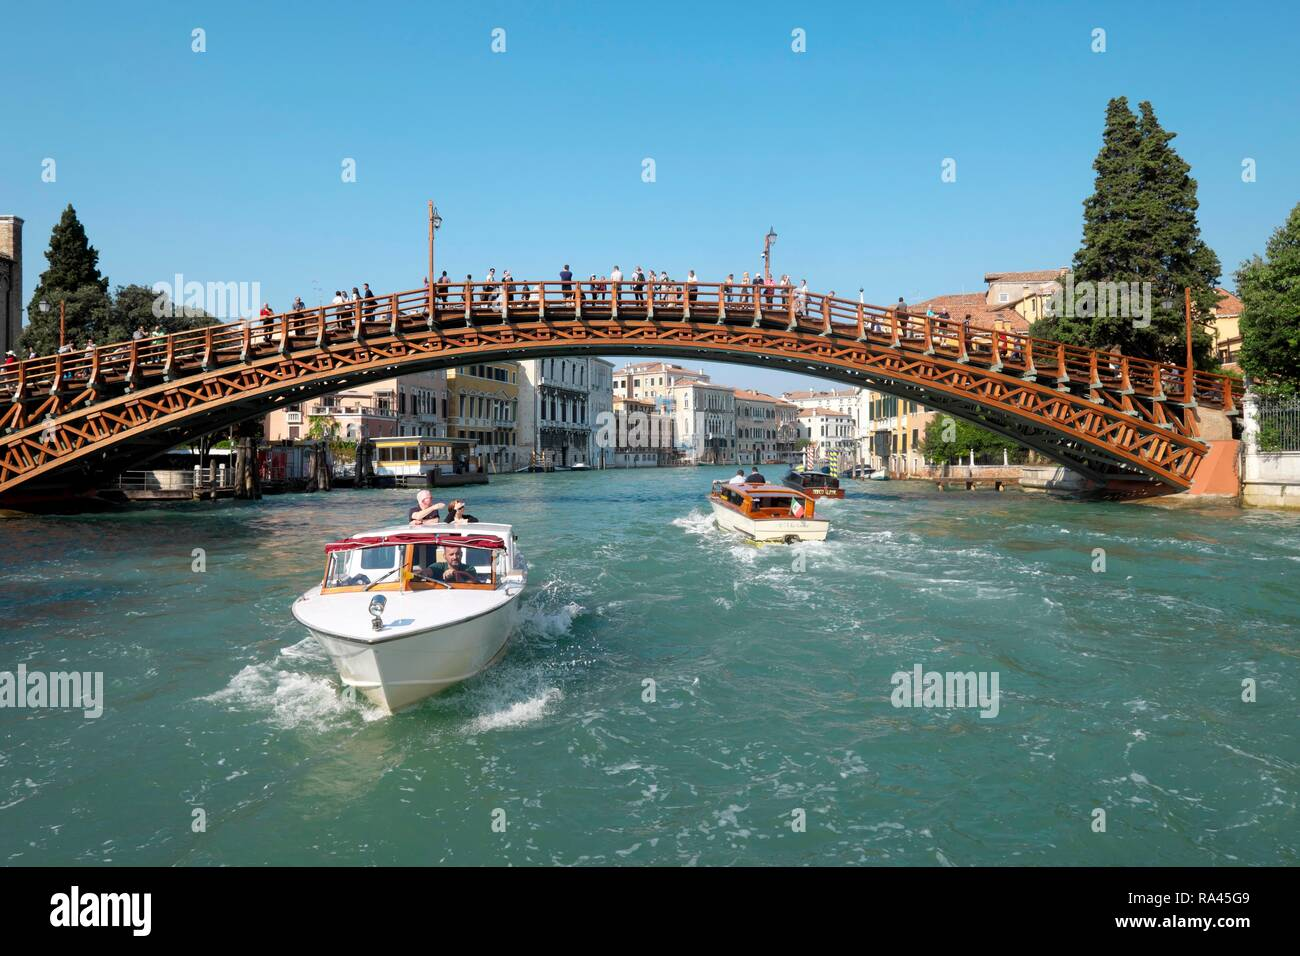 Accademia Bridge, Ponte Accademia, Motorboats in Canal Grande, Venice, Veneto, Italy - Stock Image